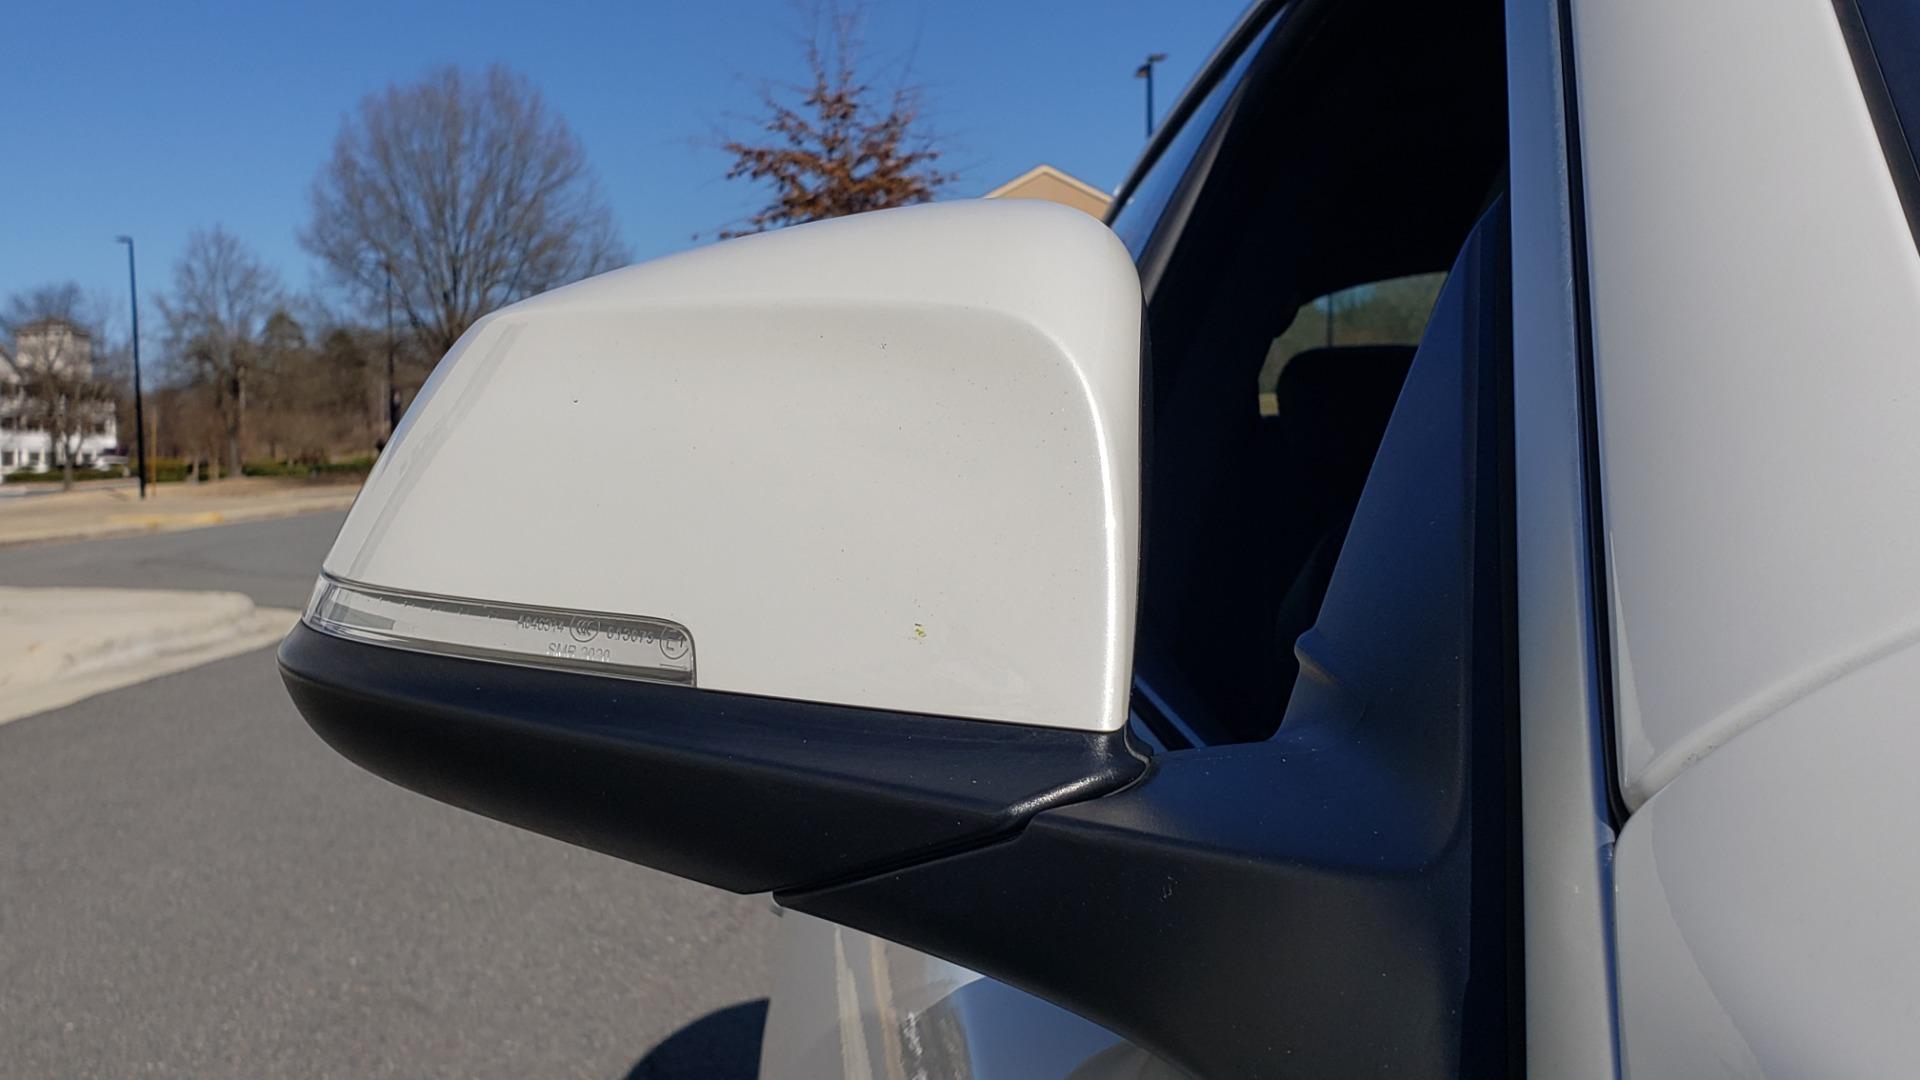 Used 2018 BMW 4 SERIES 430IXDRIVE / PREMIUM / NAV / SUNROOF / ESSENTIALS PKG for sale $28,995 at Formula Imports in Charlotte NC 28227 30